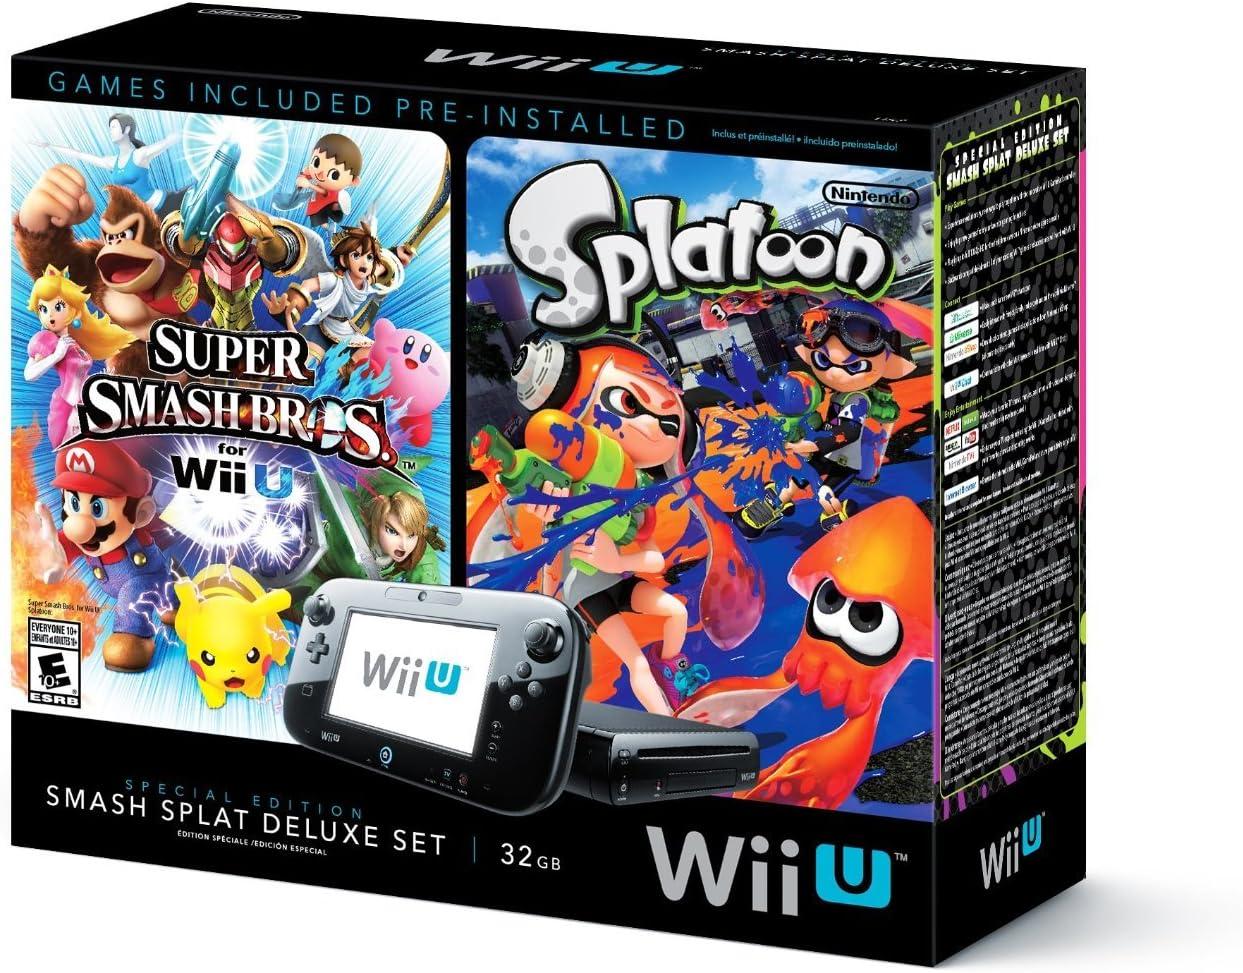 Amazon.com: Wii U Super Smash Bros and Splatoon Bundle Special Edition Deluxe Set (Certified Refurbished): Video Games